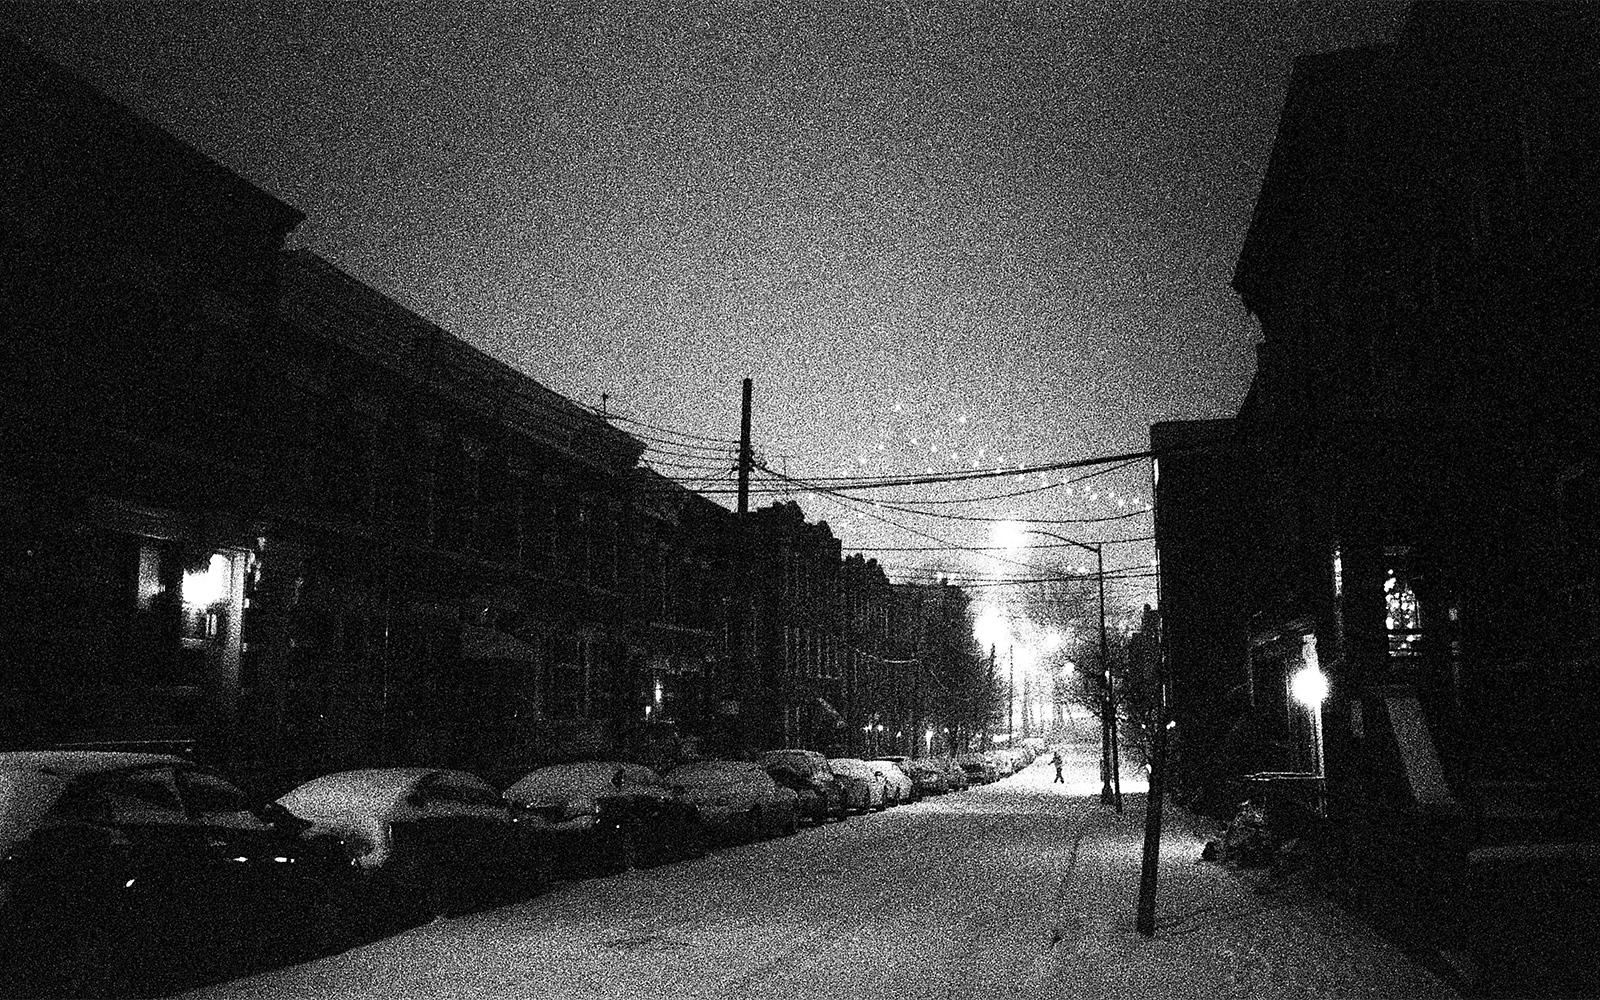 Winter Storm Hercules, Astoria, 2014